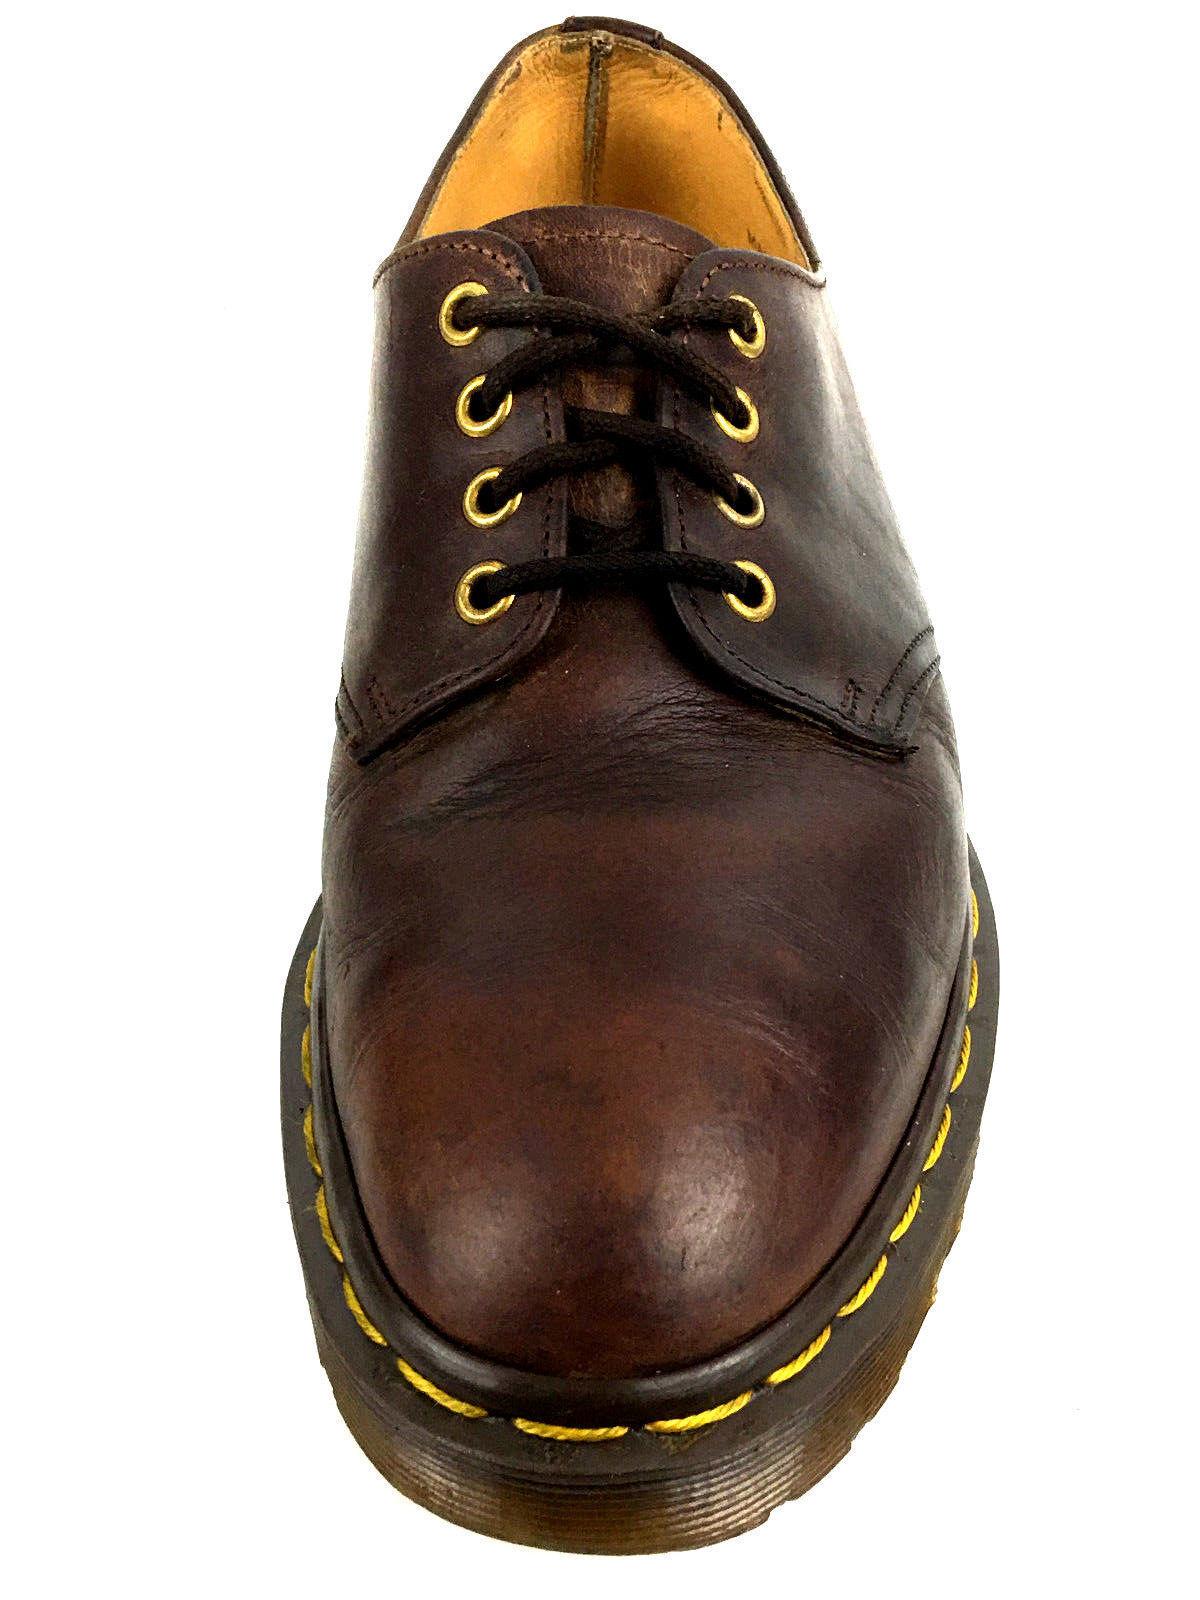 Dr. Martens Vintage Rear Classic Men's Brown Oxford Size US.8.5 UK.8 EUR.41.5